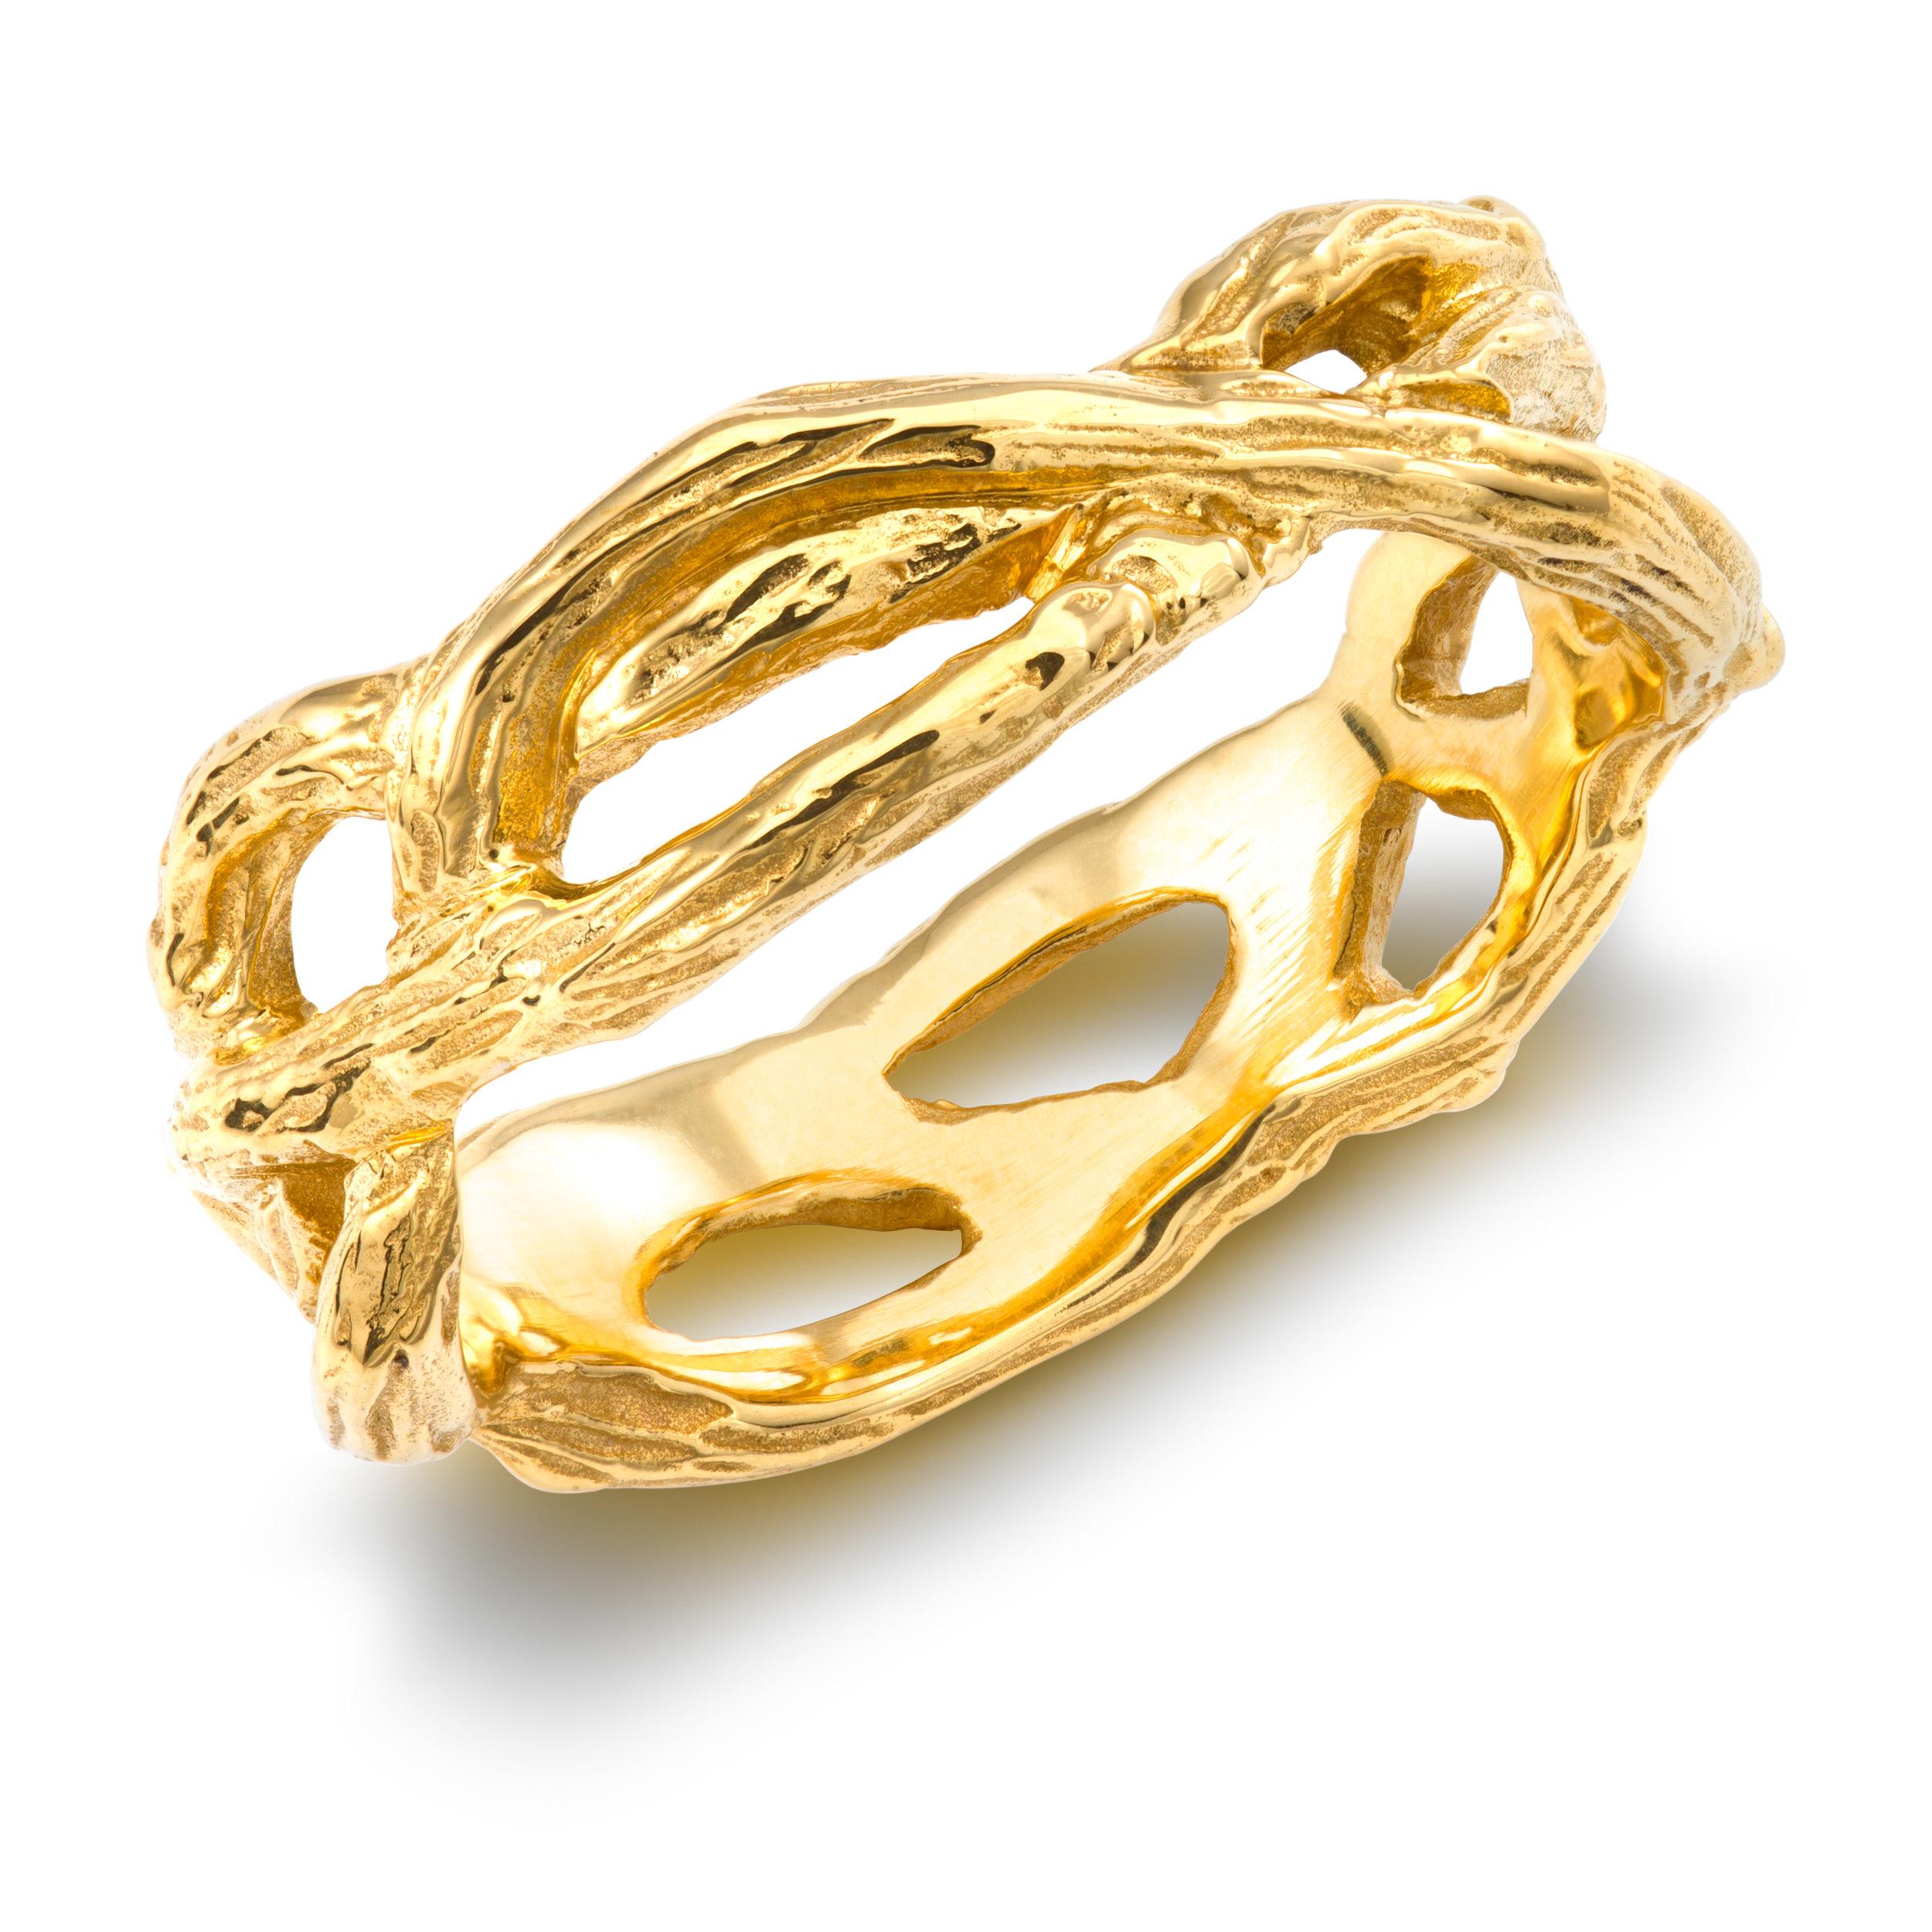 Bespoke 18ct yellow gold wedding ring commission